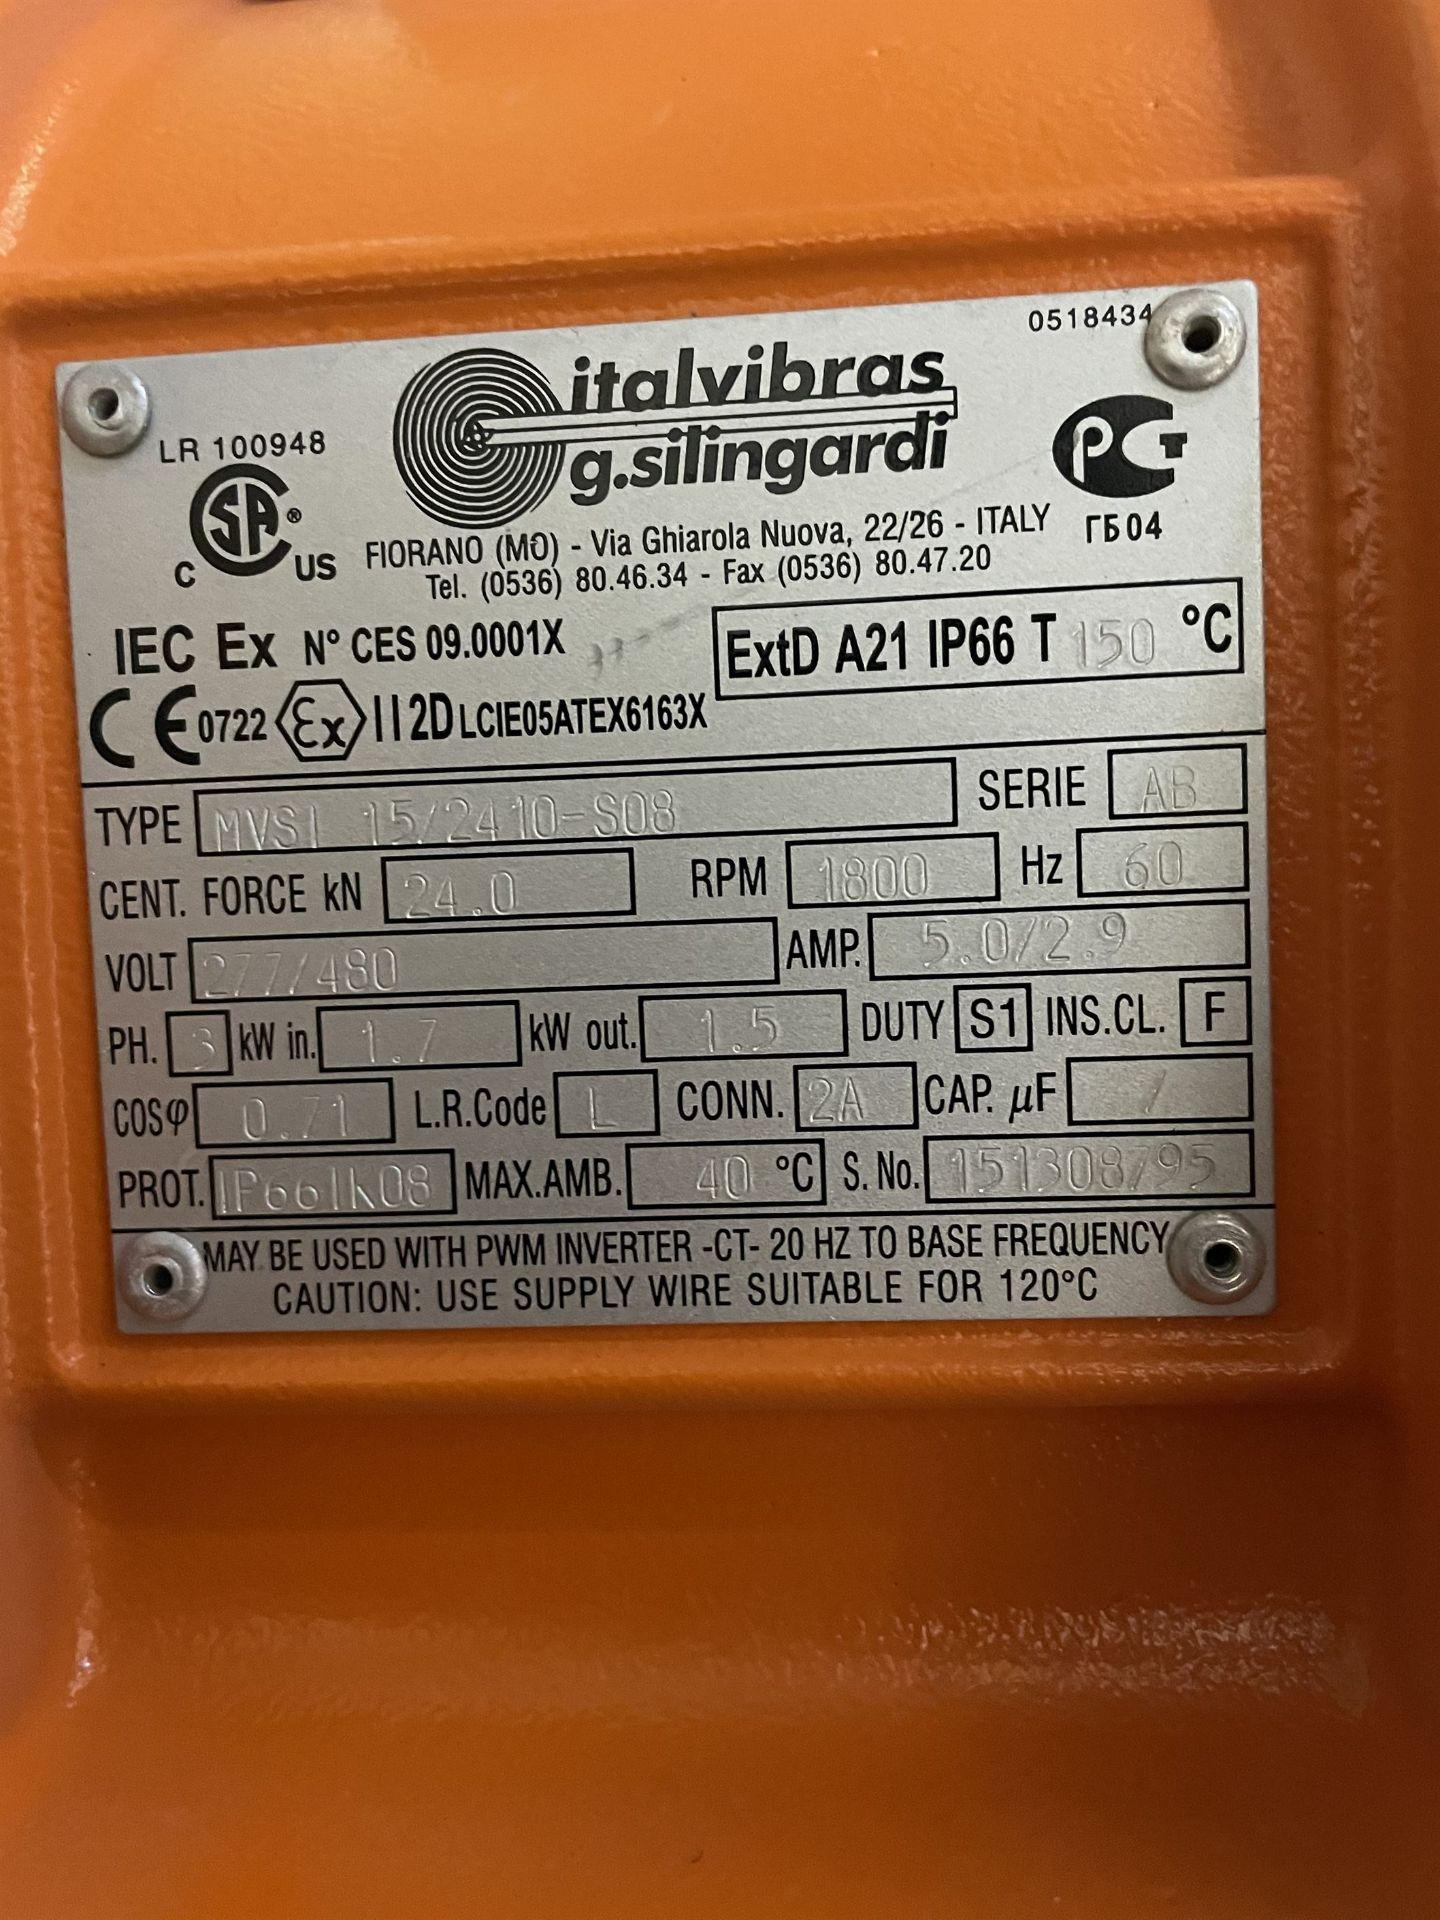 2015 SCREENING MACHINES HLOGO-60/300-25 Shaker Screen, s/n 1512A2186-2, 600 x 3000 x 250mm - Image 5 of 10